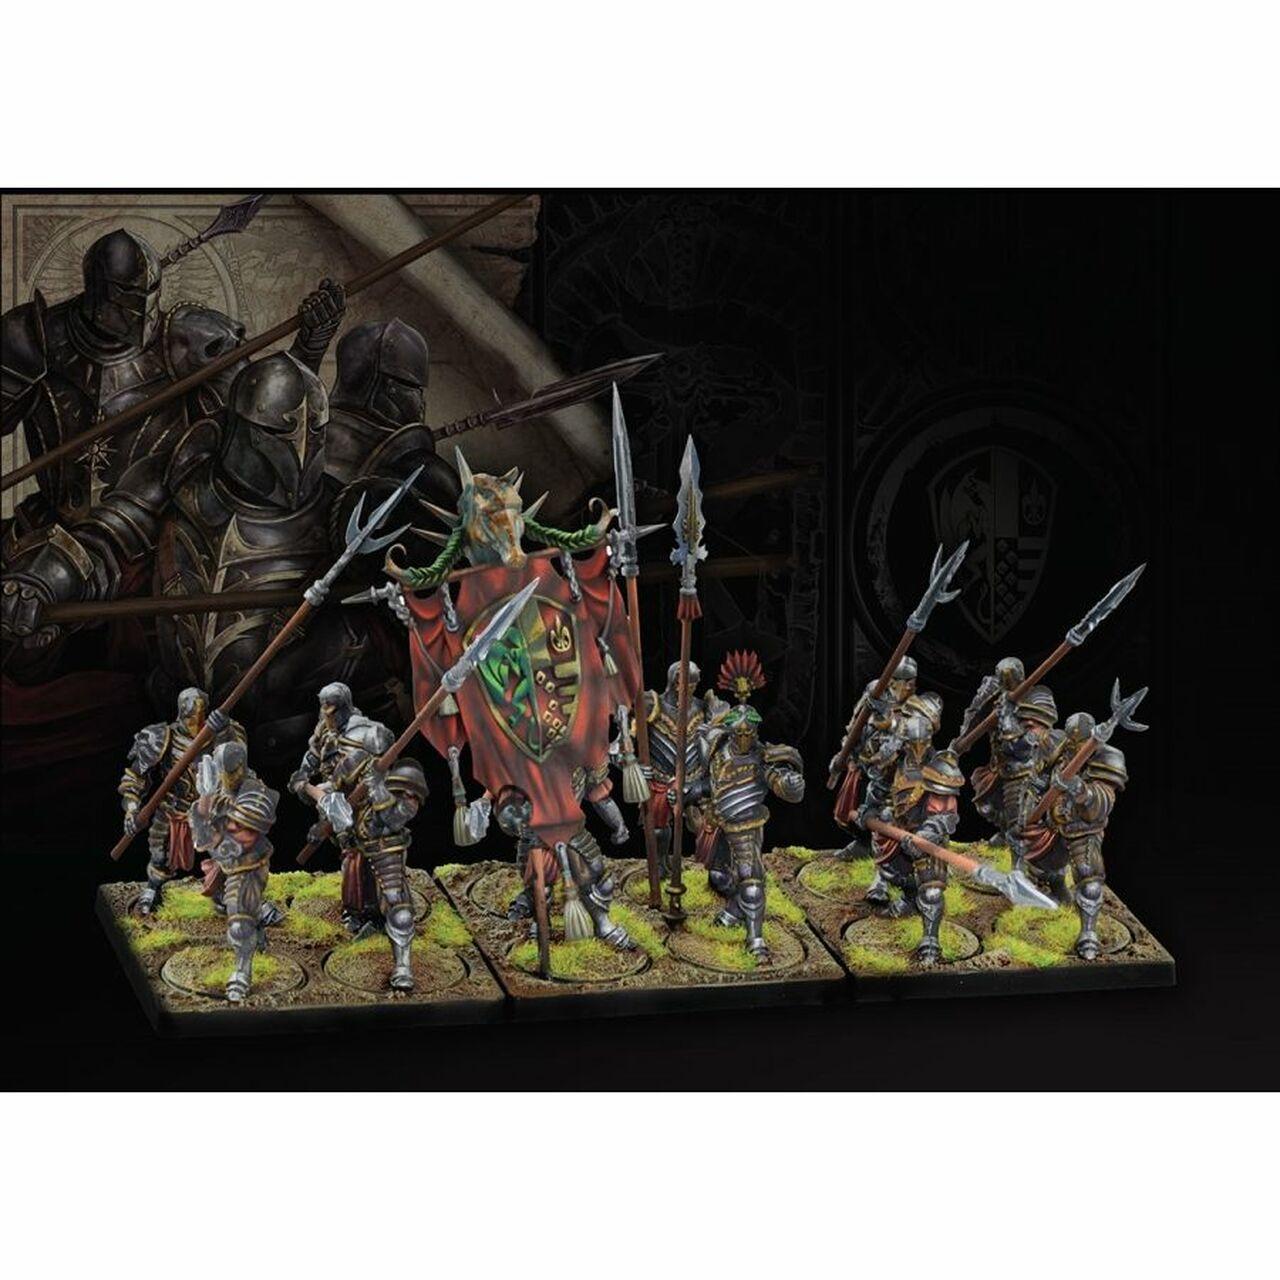 Conquest, Hundred Kingdoms - Gilded Legions (PBW2228)